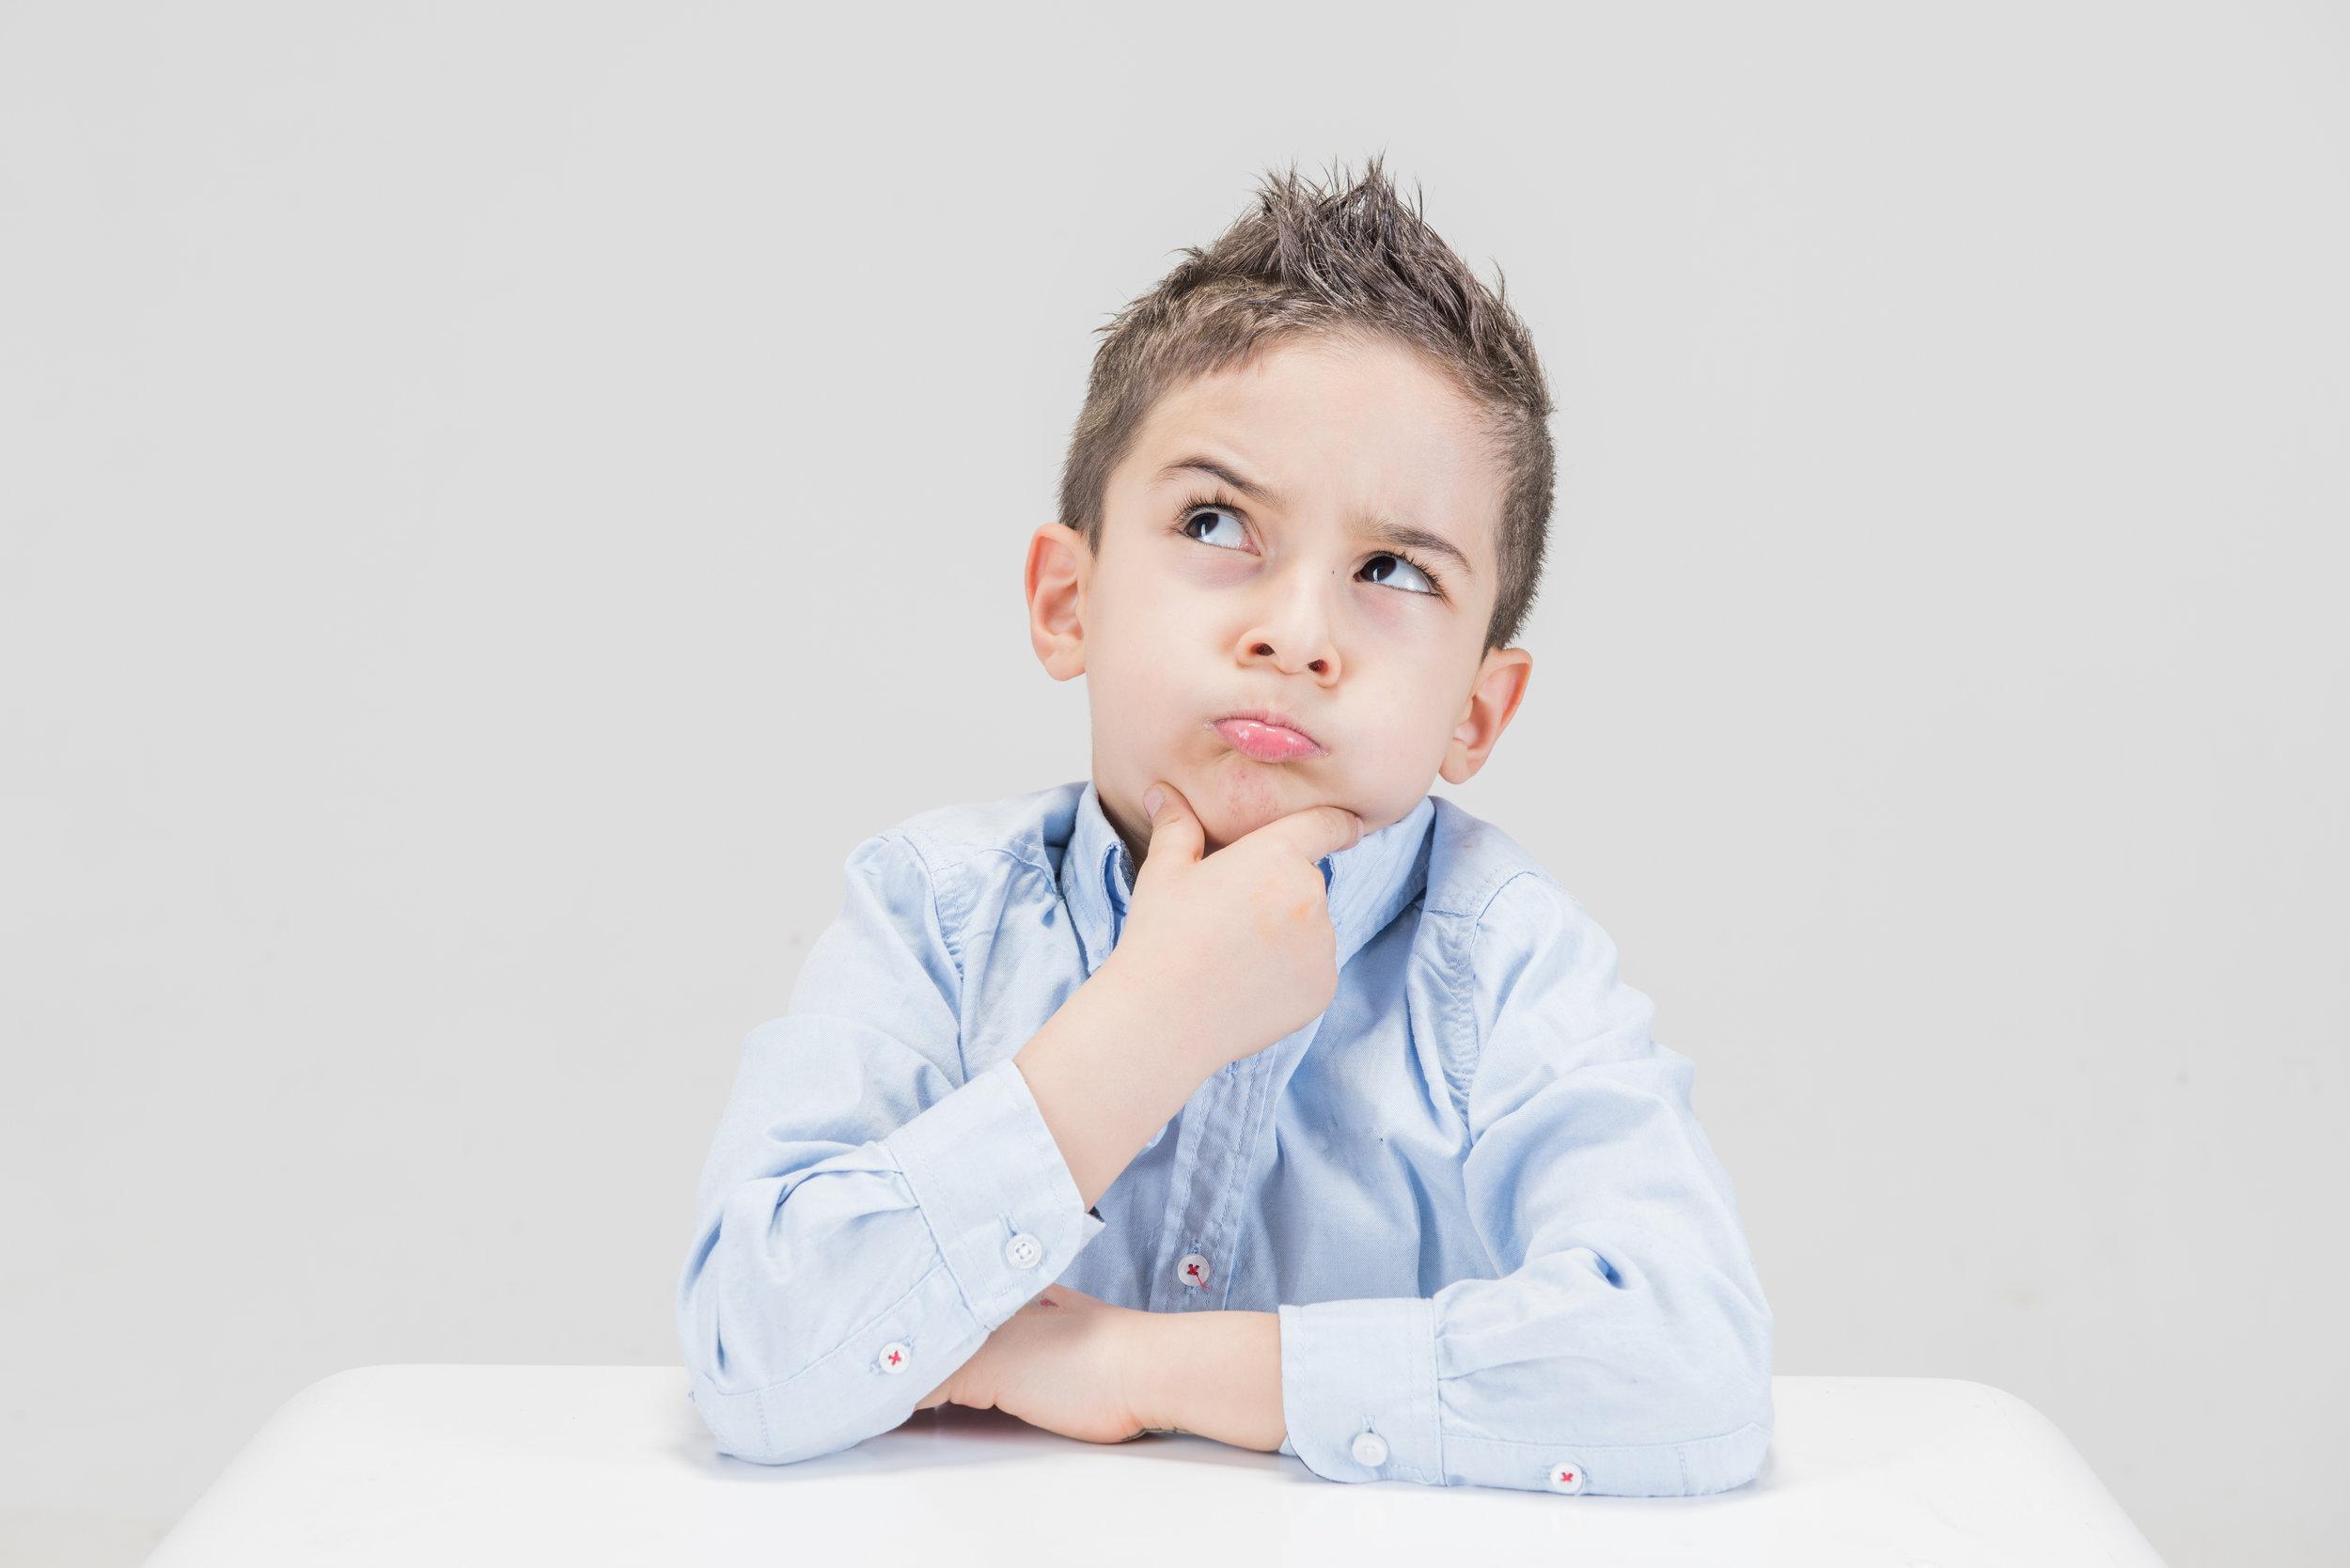 boy-thinking-calculation-kid-child-sitting-1428411-pxhere.com.jpg